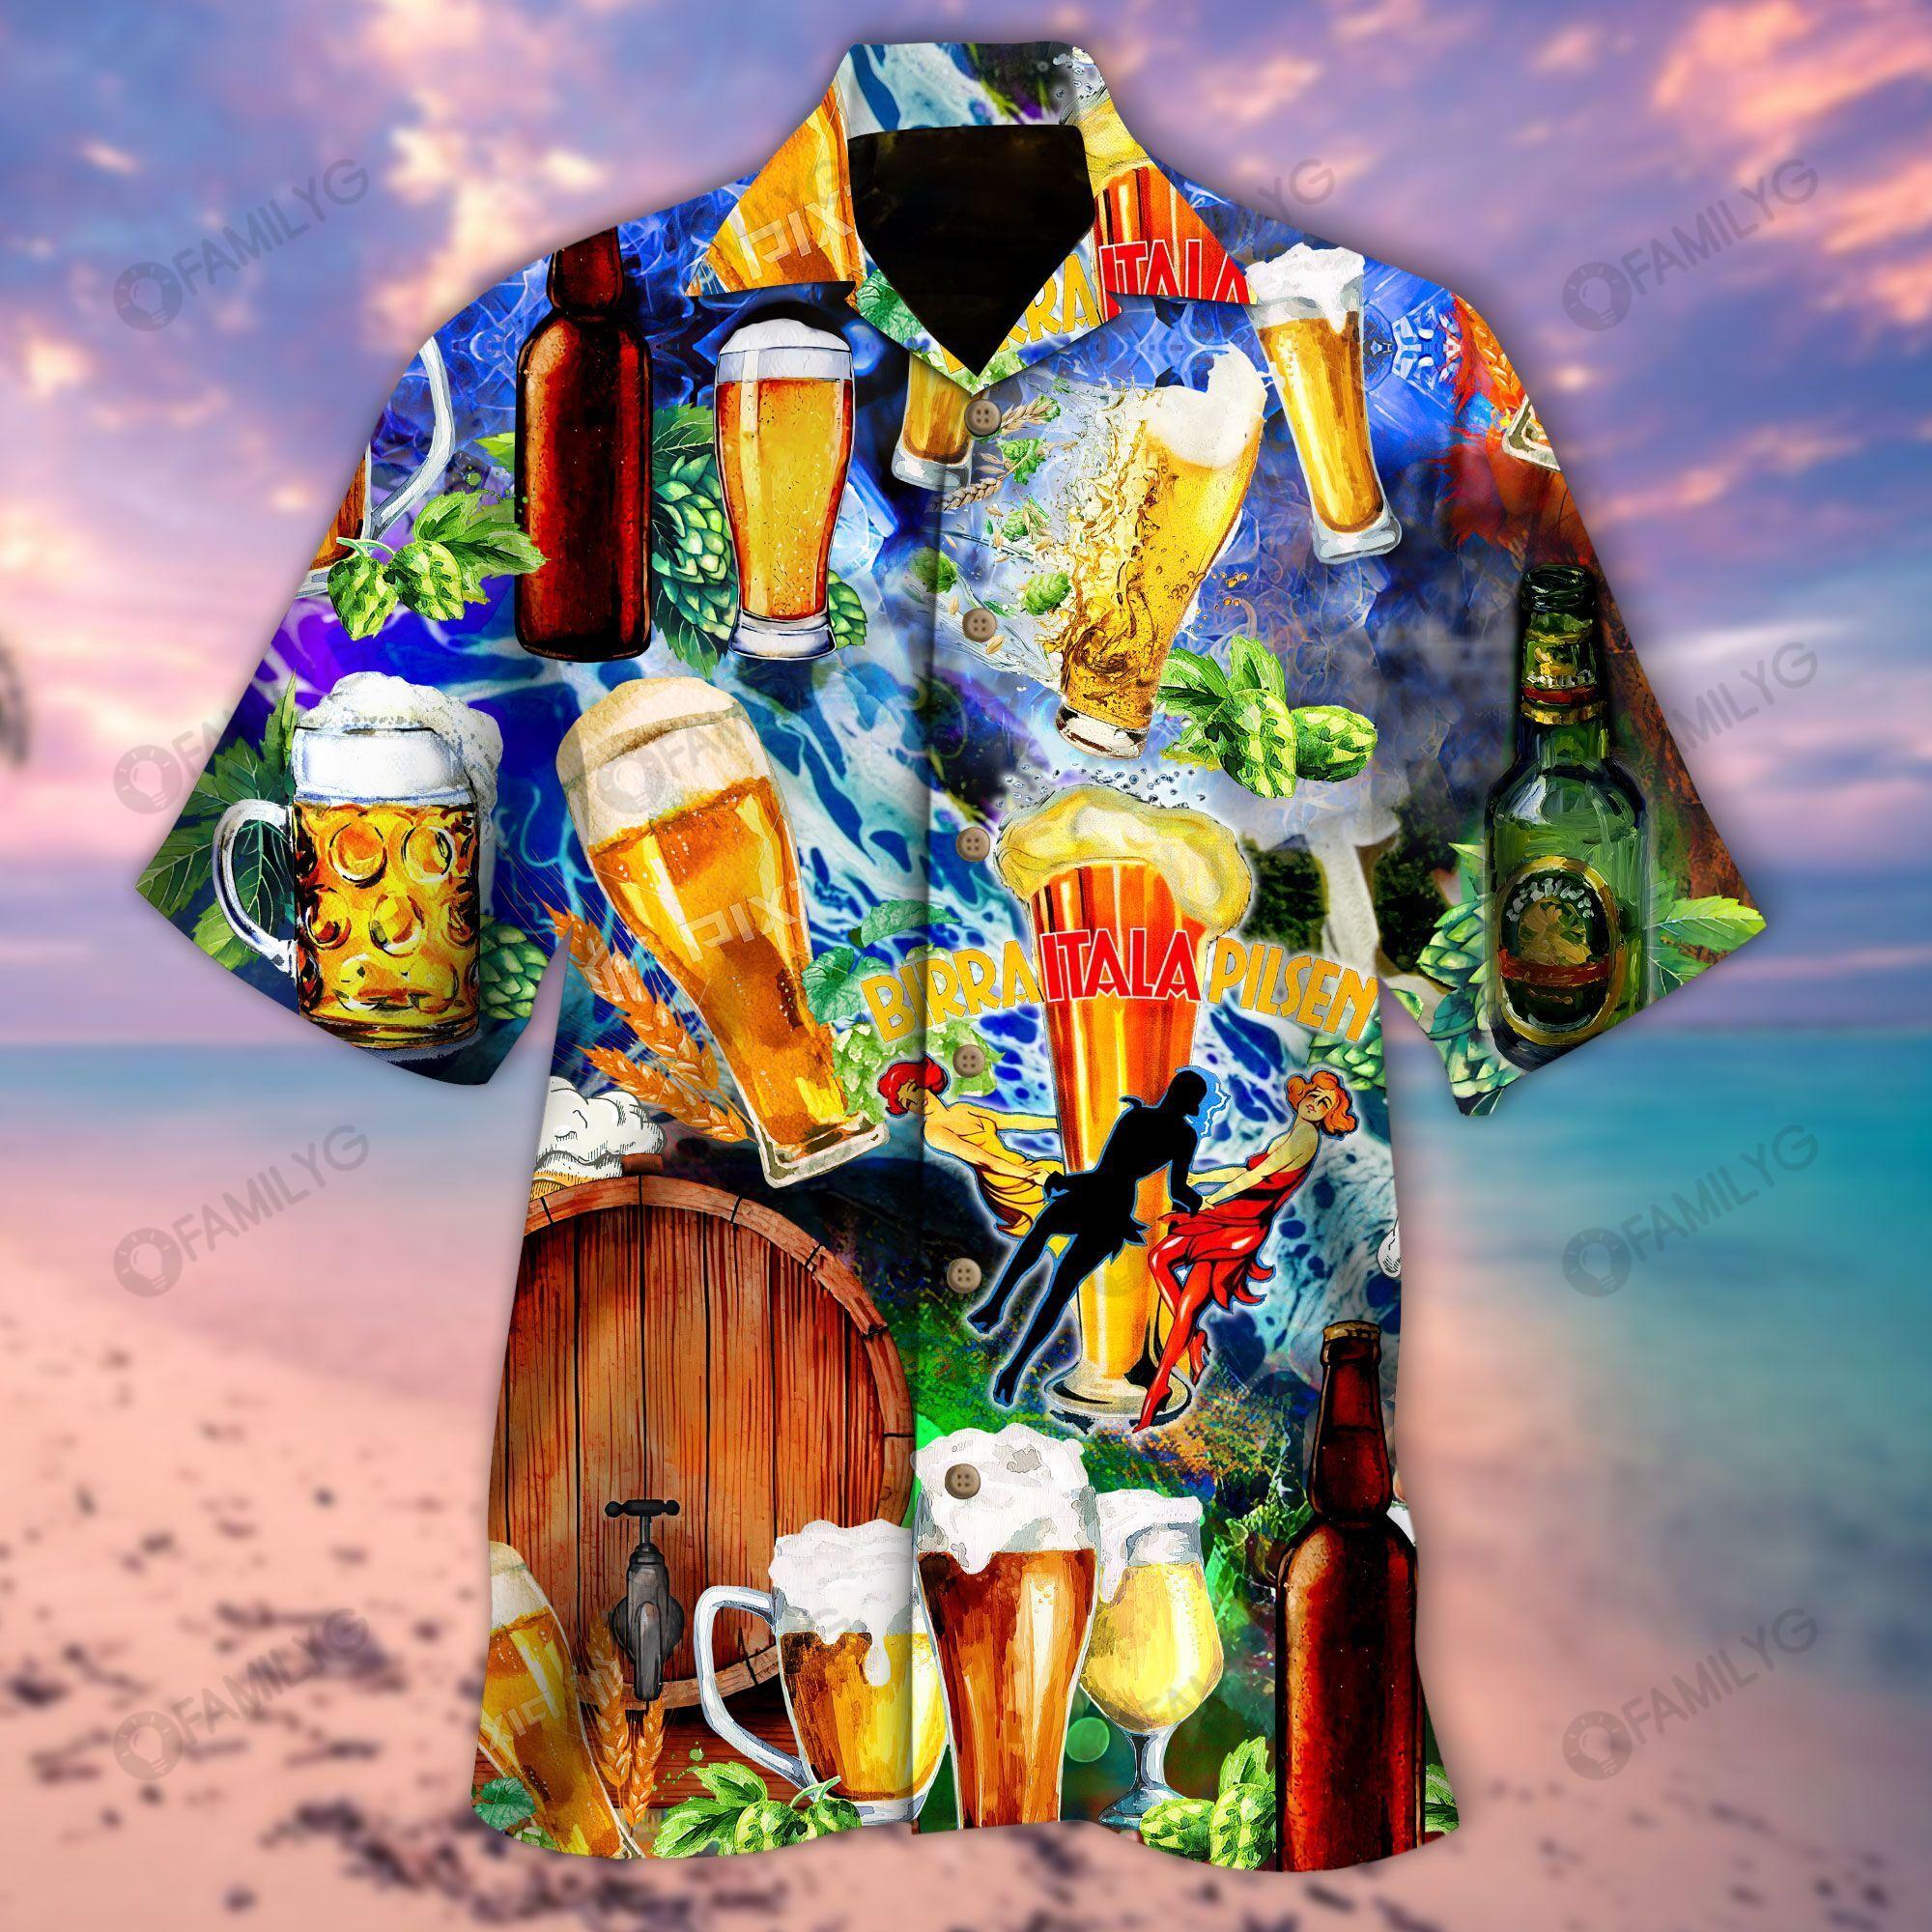 Aloha Shirt Blessings Of Your Heart You Brew Good Ale Beer Hawaiian Shirt